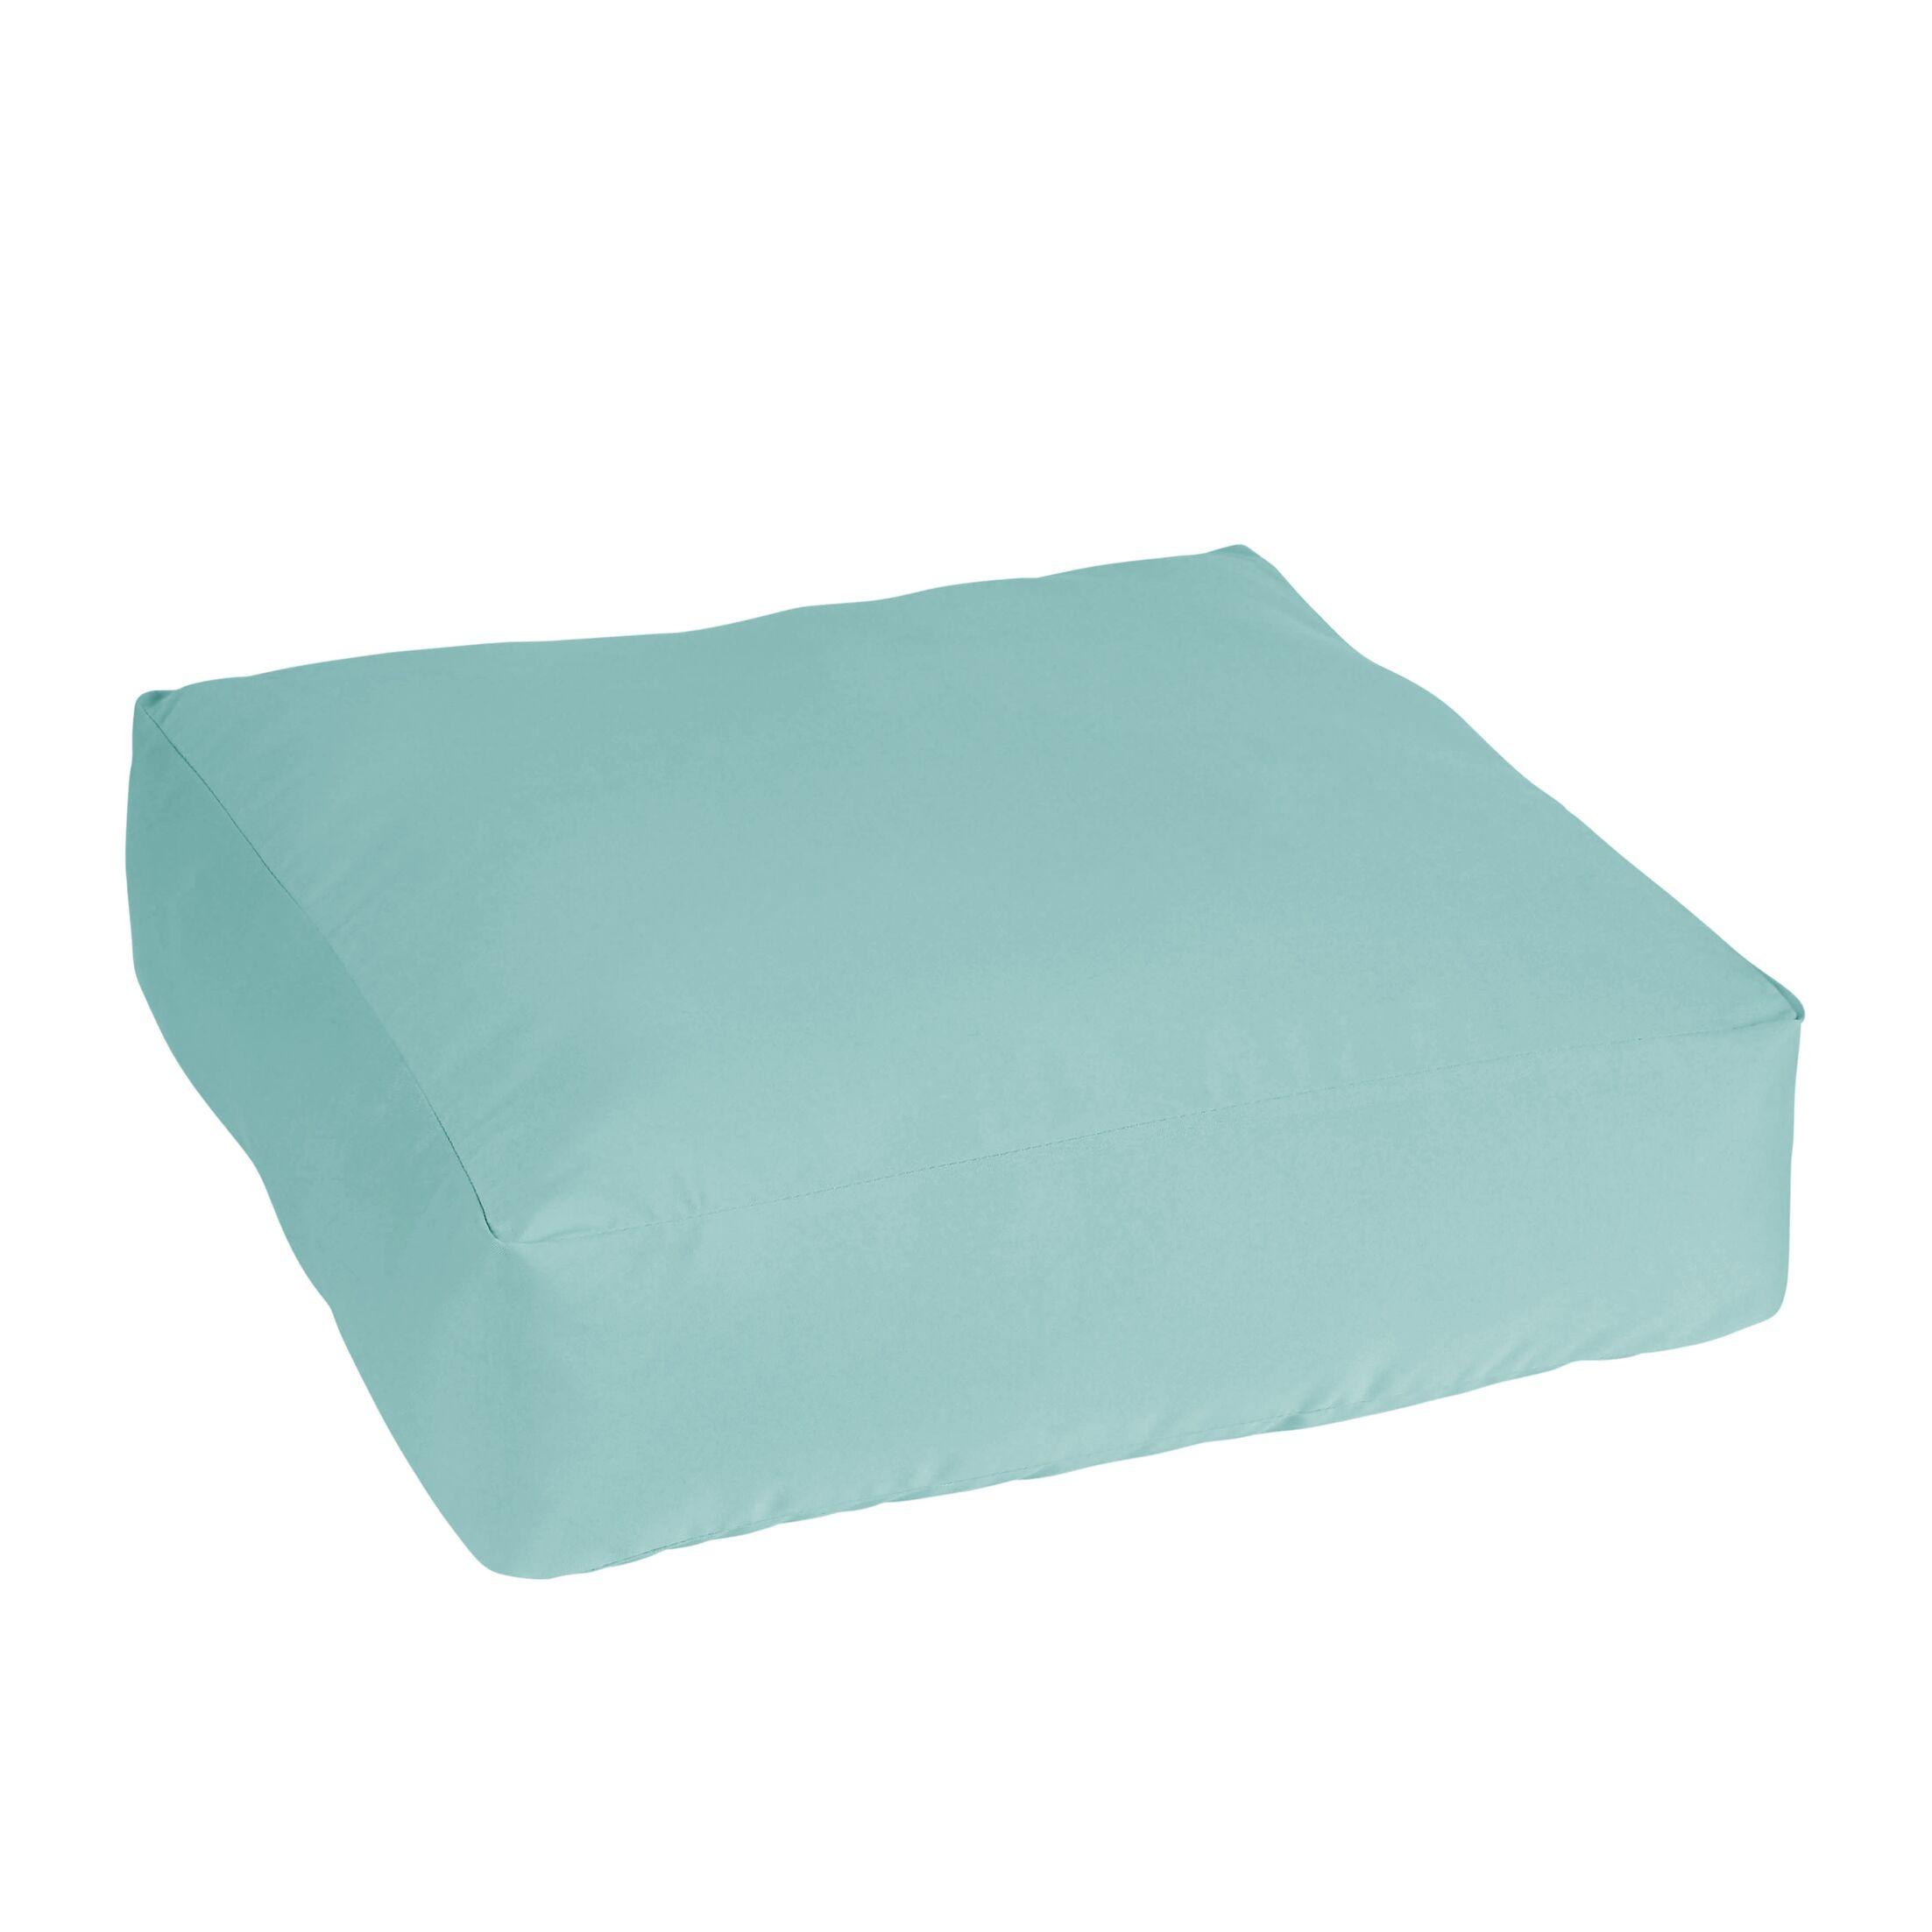 Colville Stain Resistant Indoor/Outdoor Square Floor Pillow